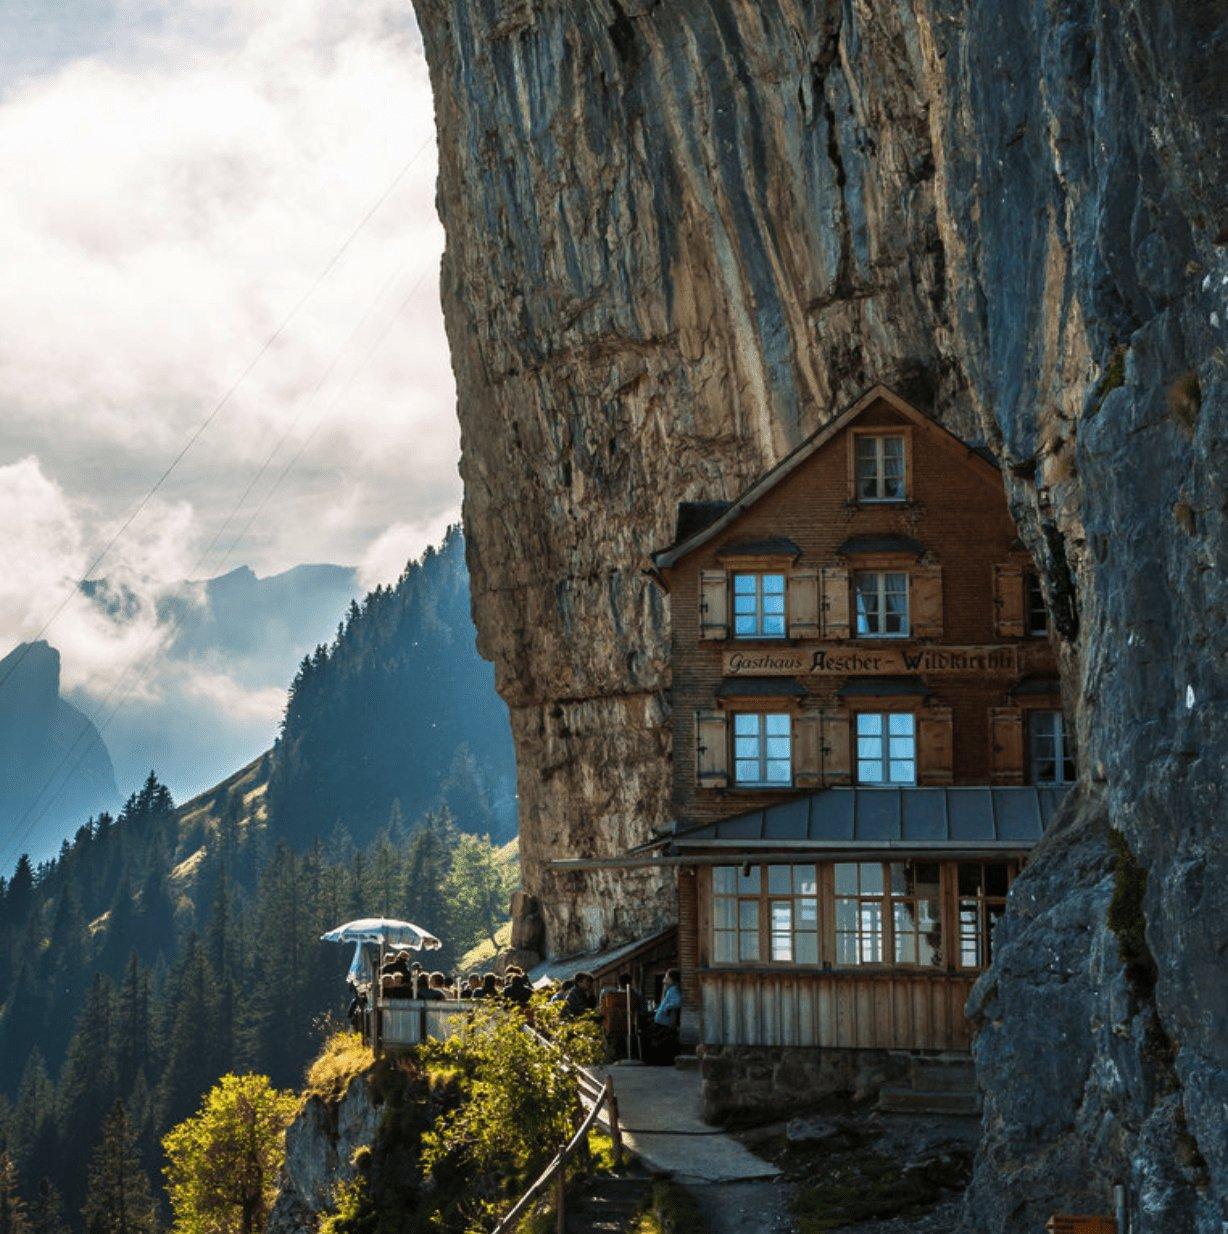 Aescher Restaurant clinging to a mountainside in Switzerland